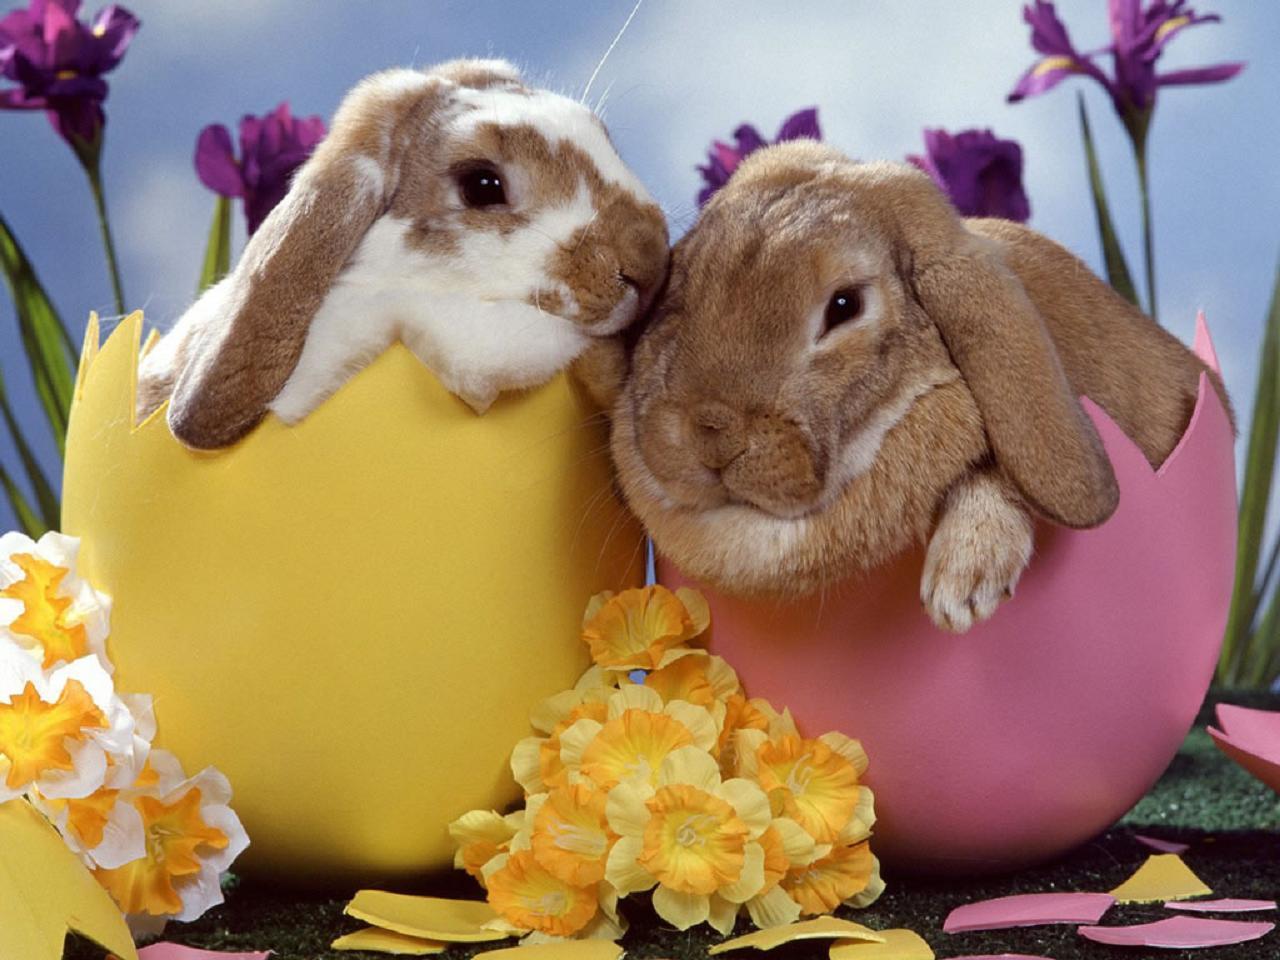 http://1.bp.blogspot.com/-UET4XDwnbMM/TbS_x7BsOJI/AAAAAAAADl8/5iape_A-29c/s1600/easter-bunny.jpg#HAPPY%20EASTER